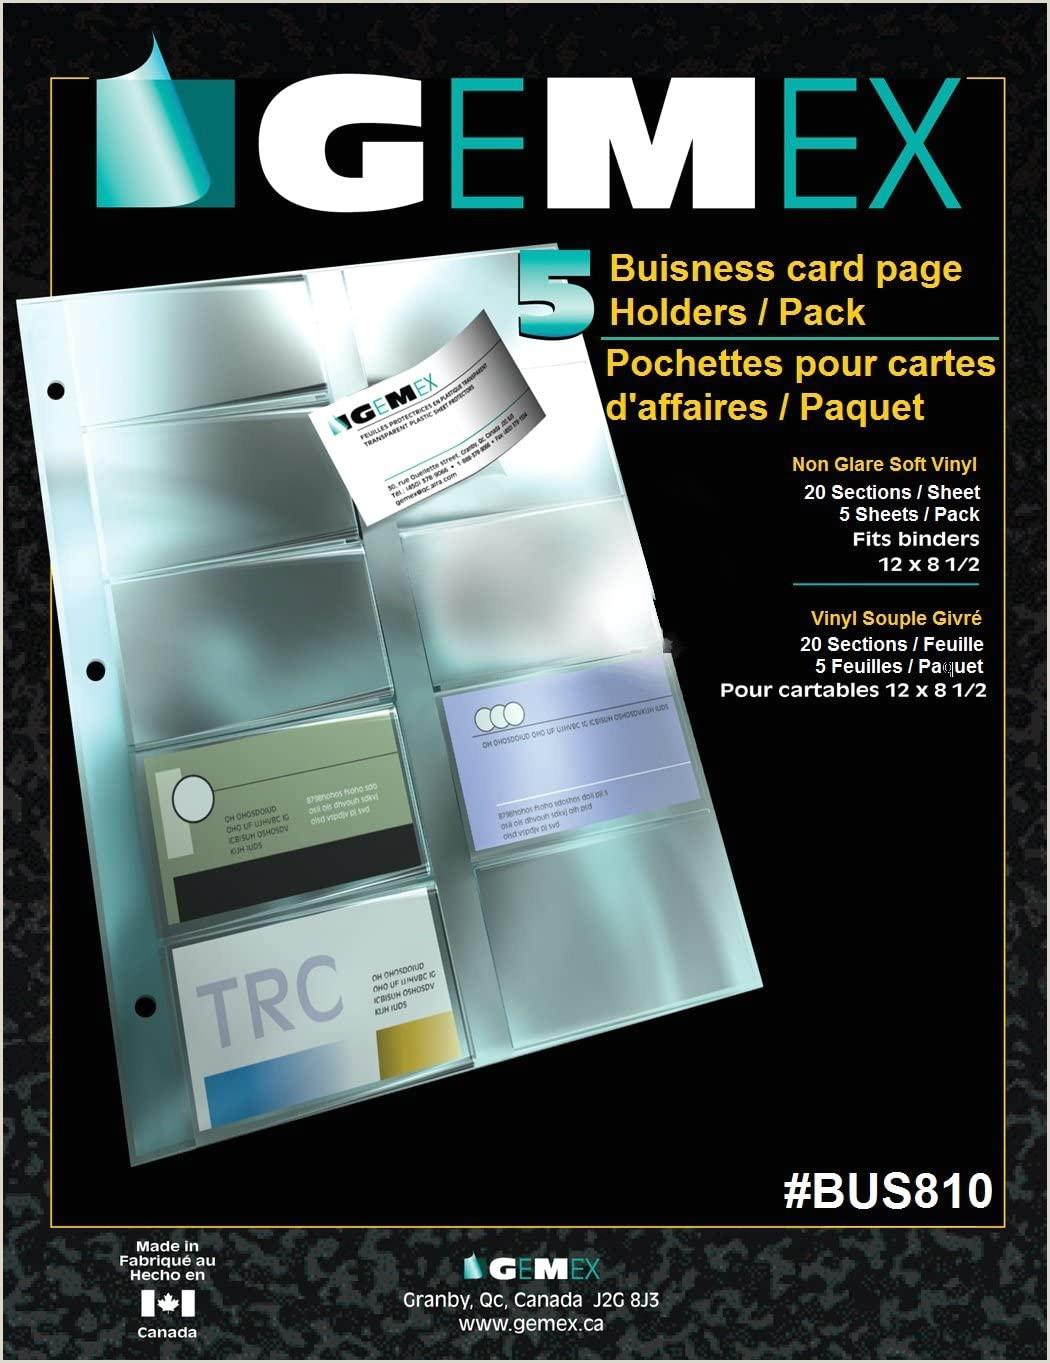 How To Make Buisness Cards Gemex Vinyl Business Card Holder For Bch 200l Aurex Binders